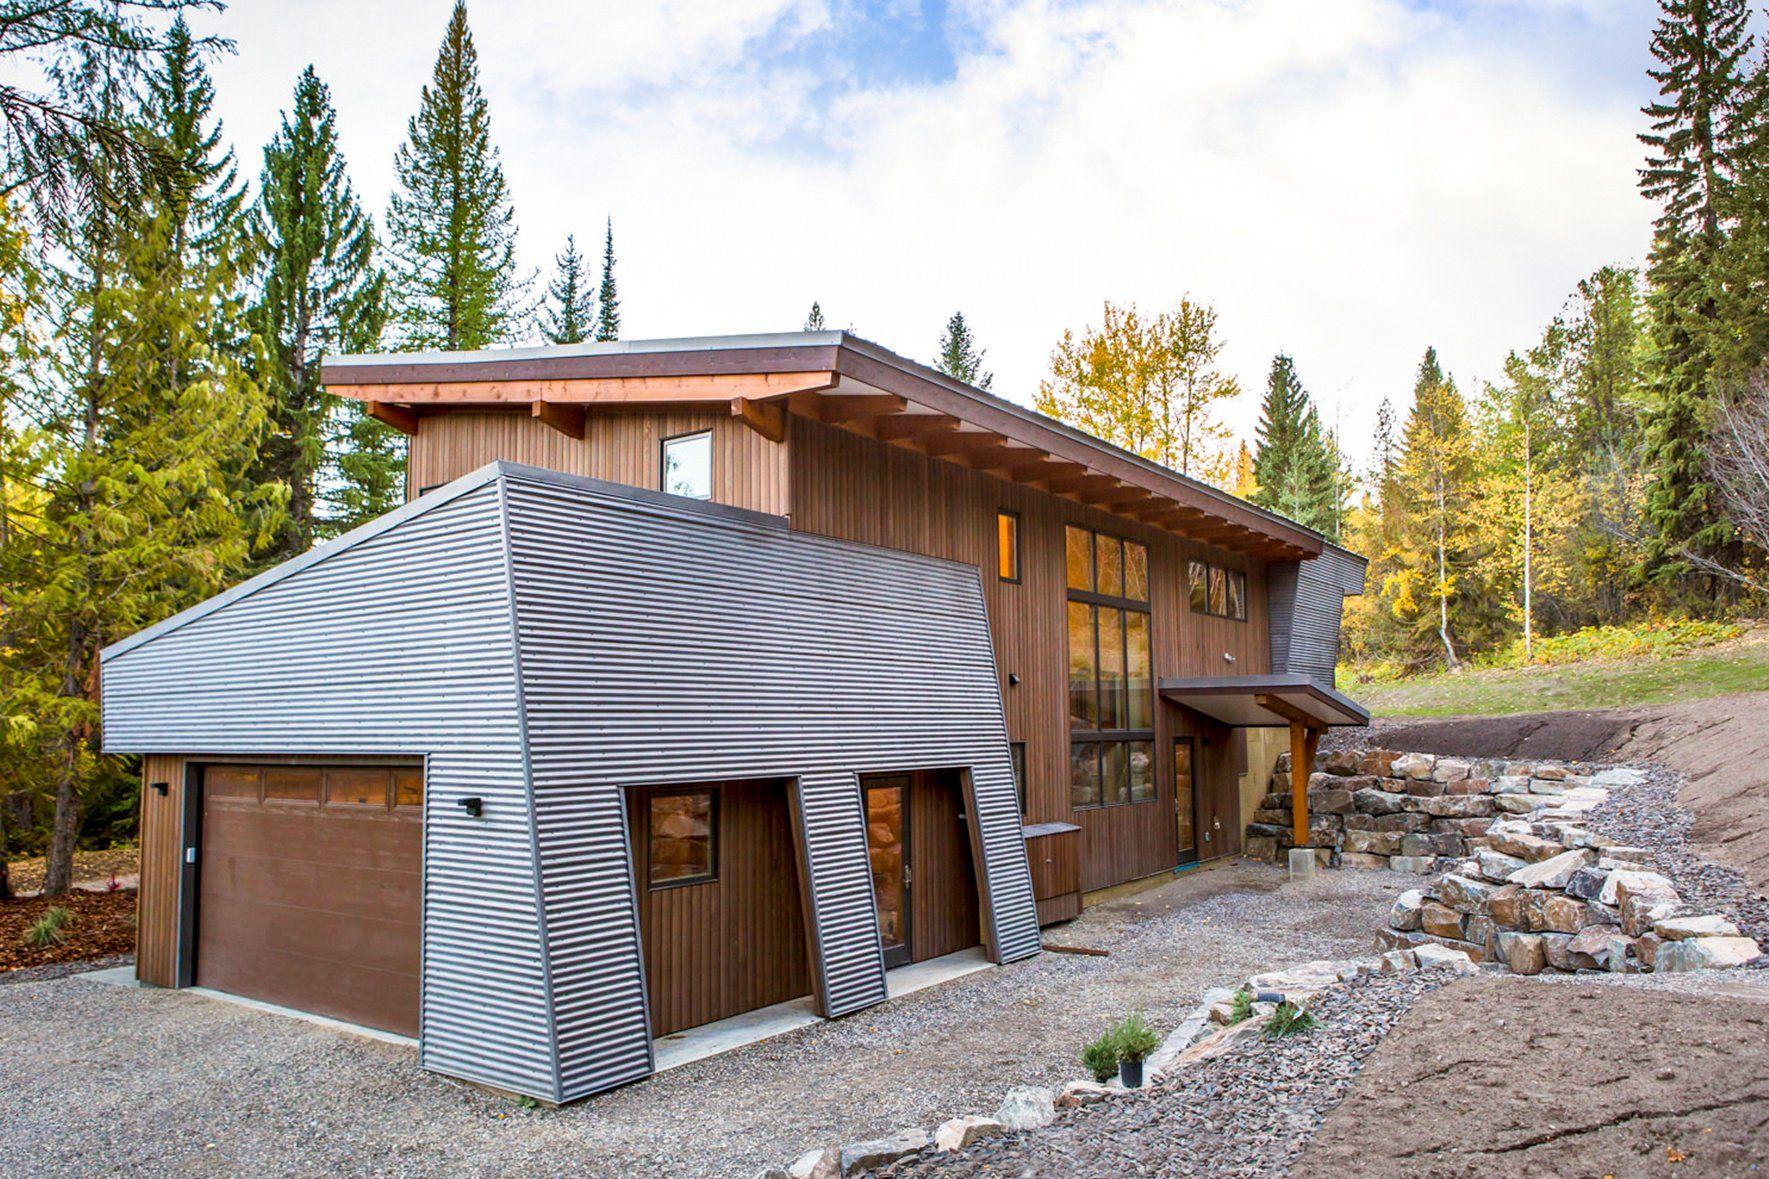 Modern Metal Roofing Siding Interior Decorative Options Metal Building Designs Metal Buildings Building Design